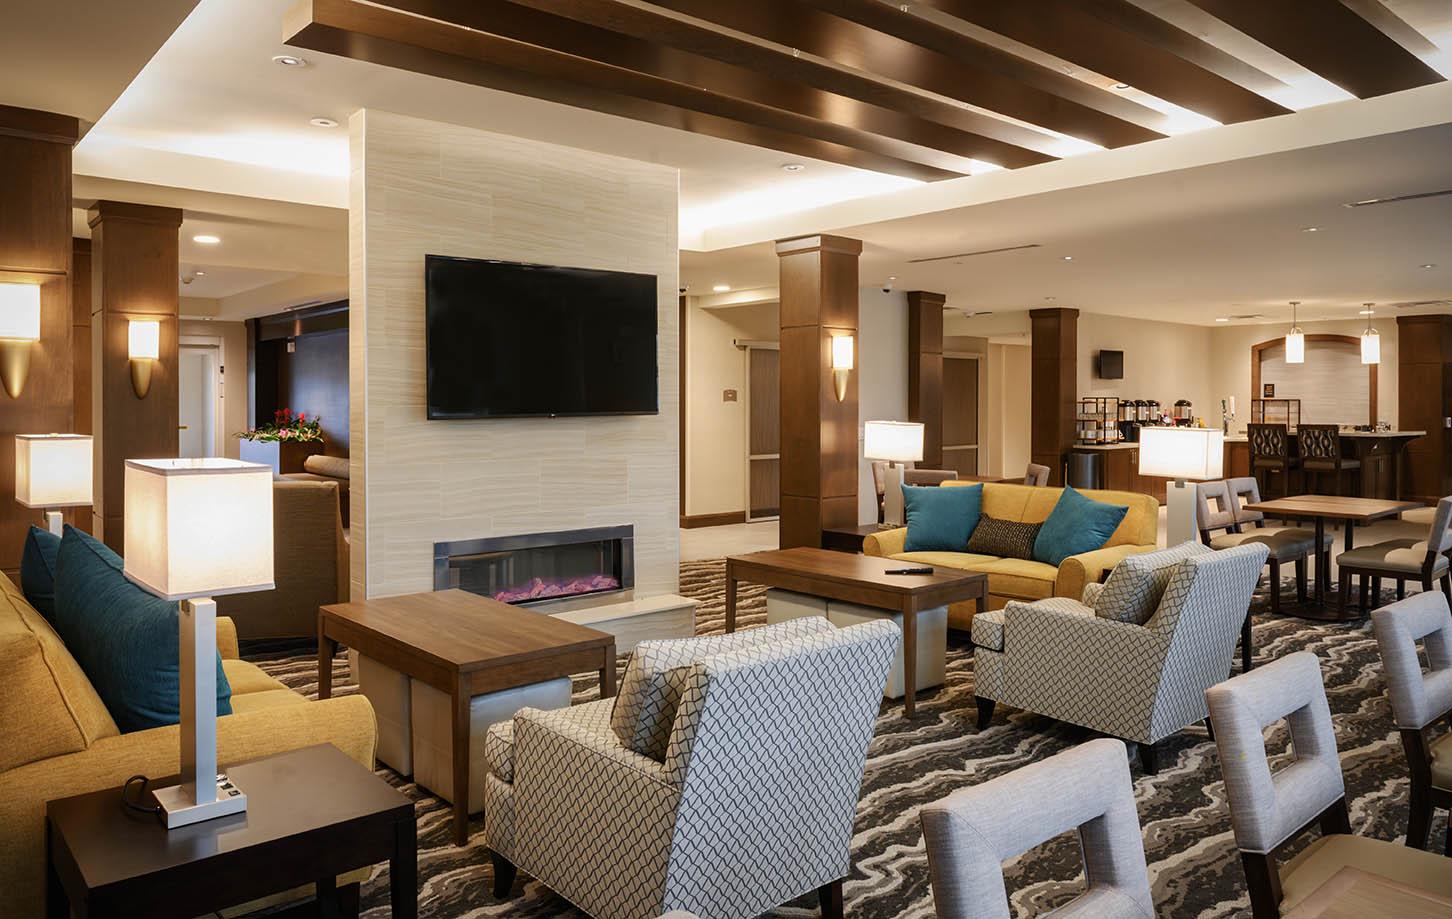 Staybridge Suites lobby